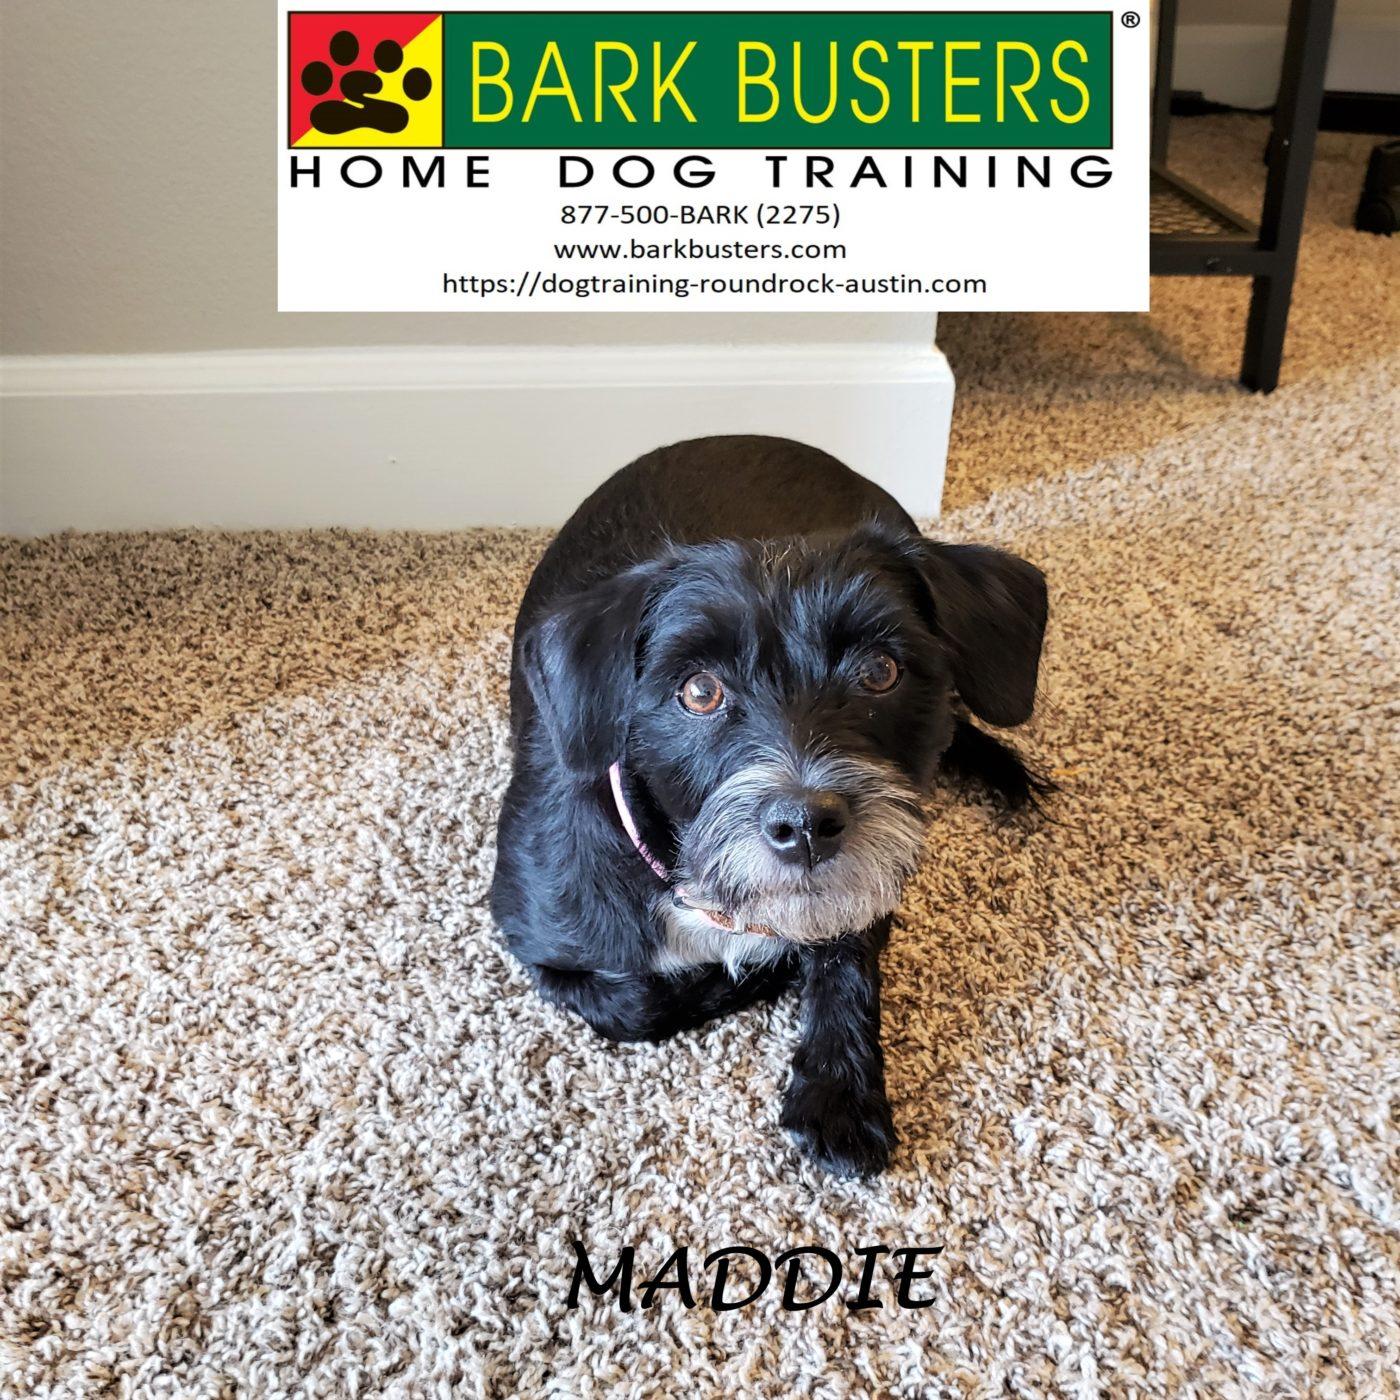 #terrier #obediencetraining #speakdog #dogtrainingeastaustin #atx #inhomedogtraining #dogsofbarkbusters